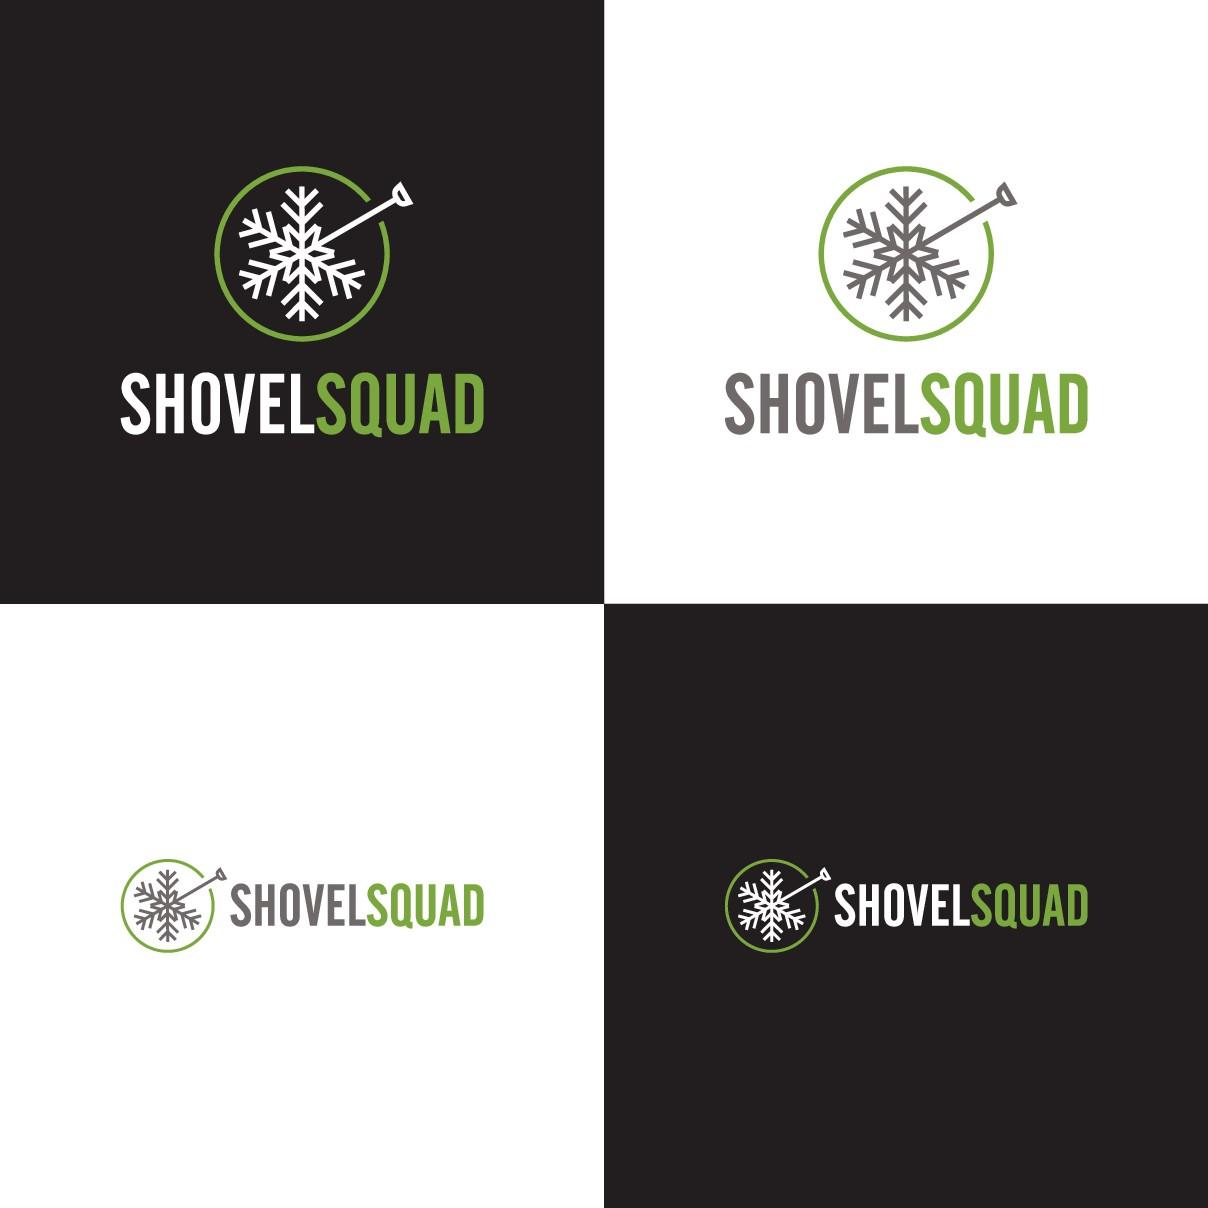 Logo Design for Residential Snow Removal Company (Shovel Squad)